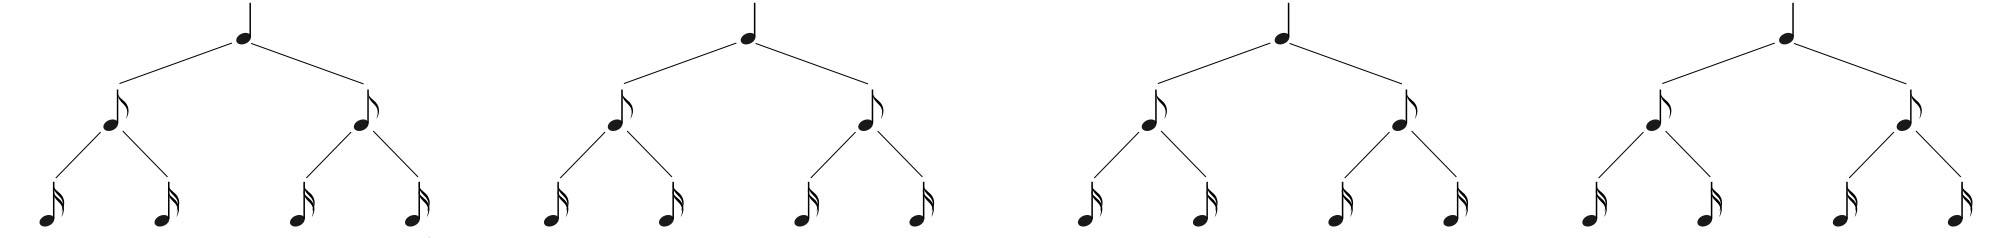 Learning Rhythm through Gospel - TeachRock